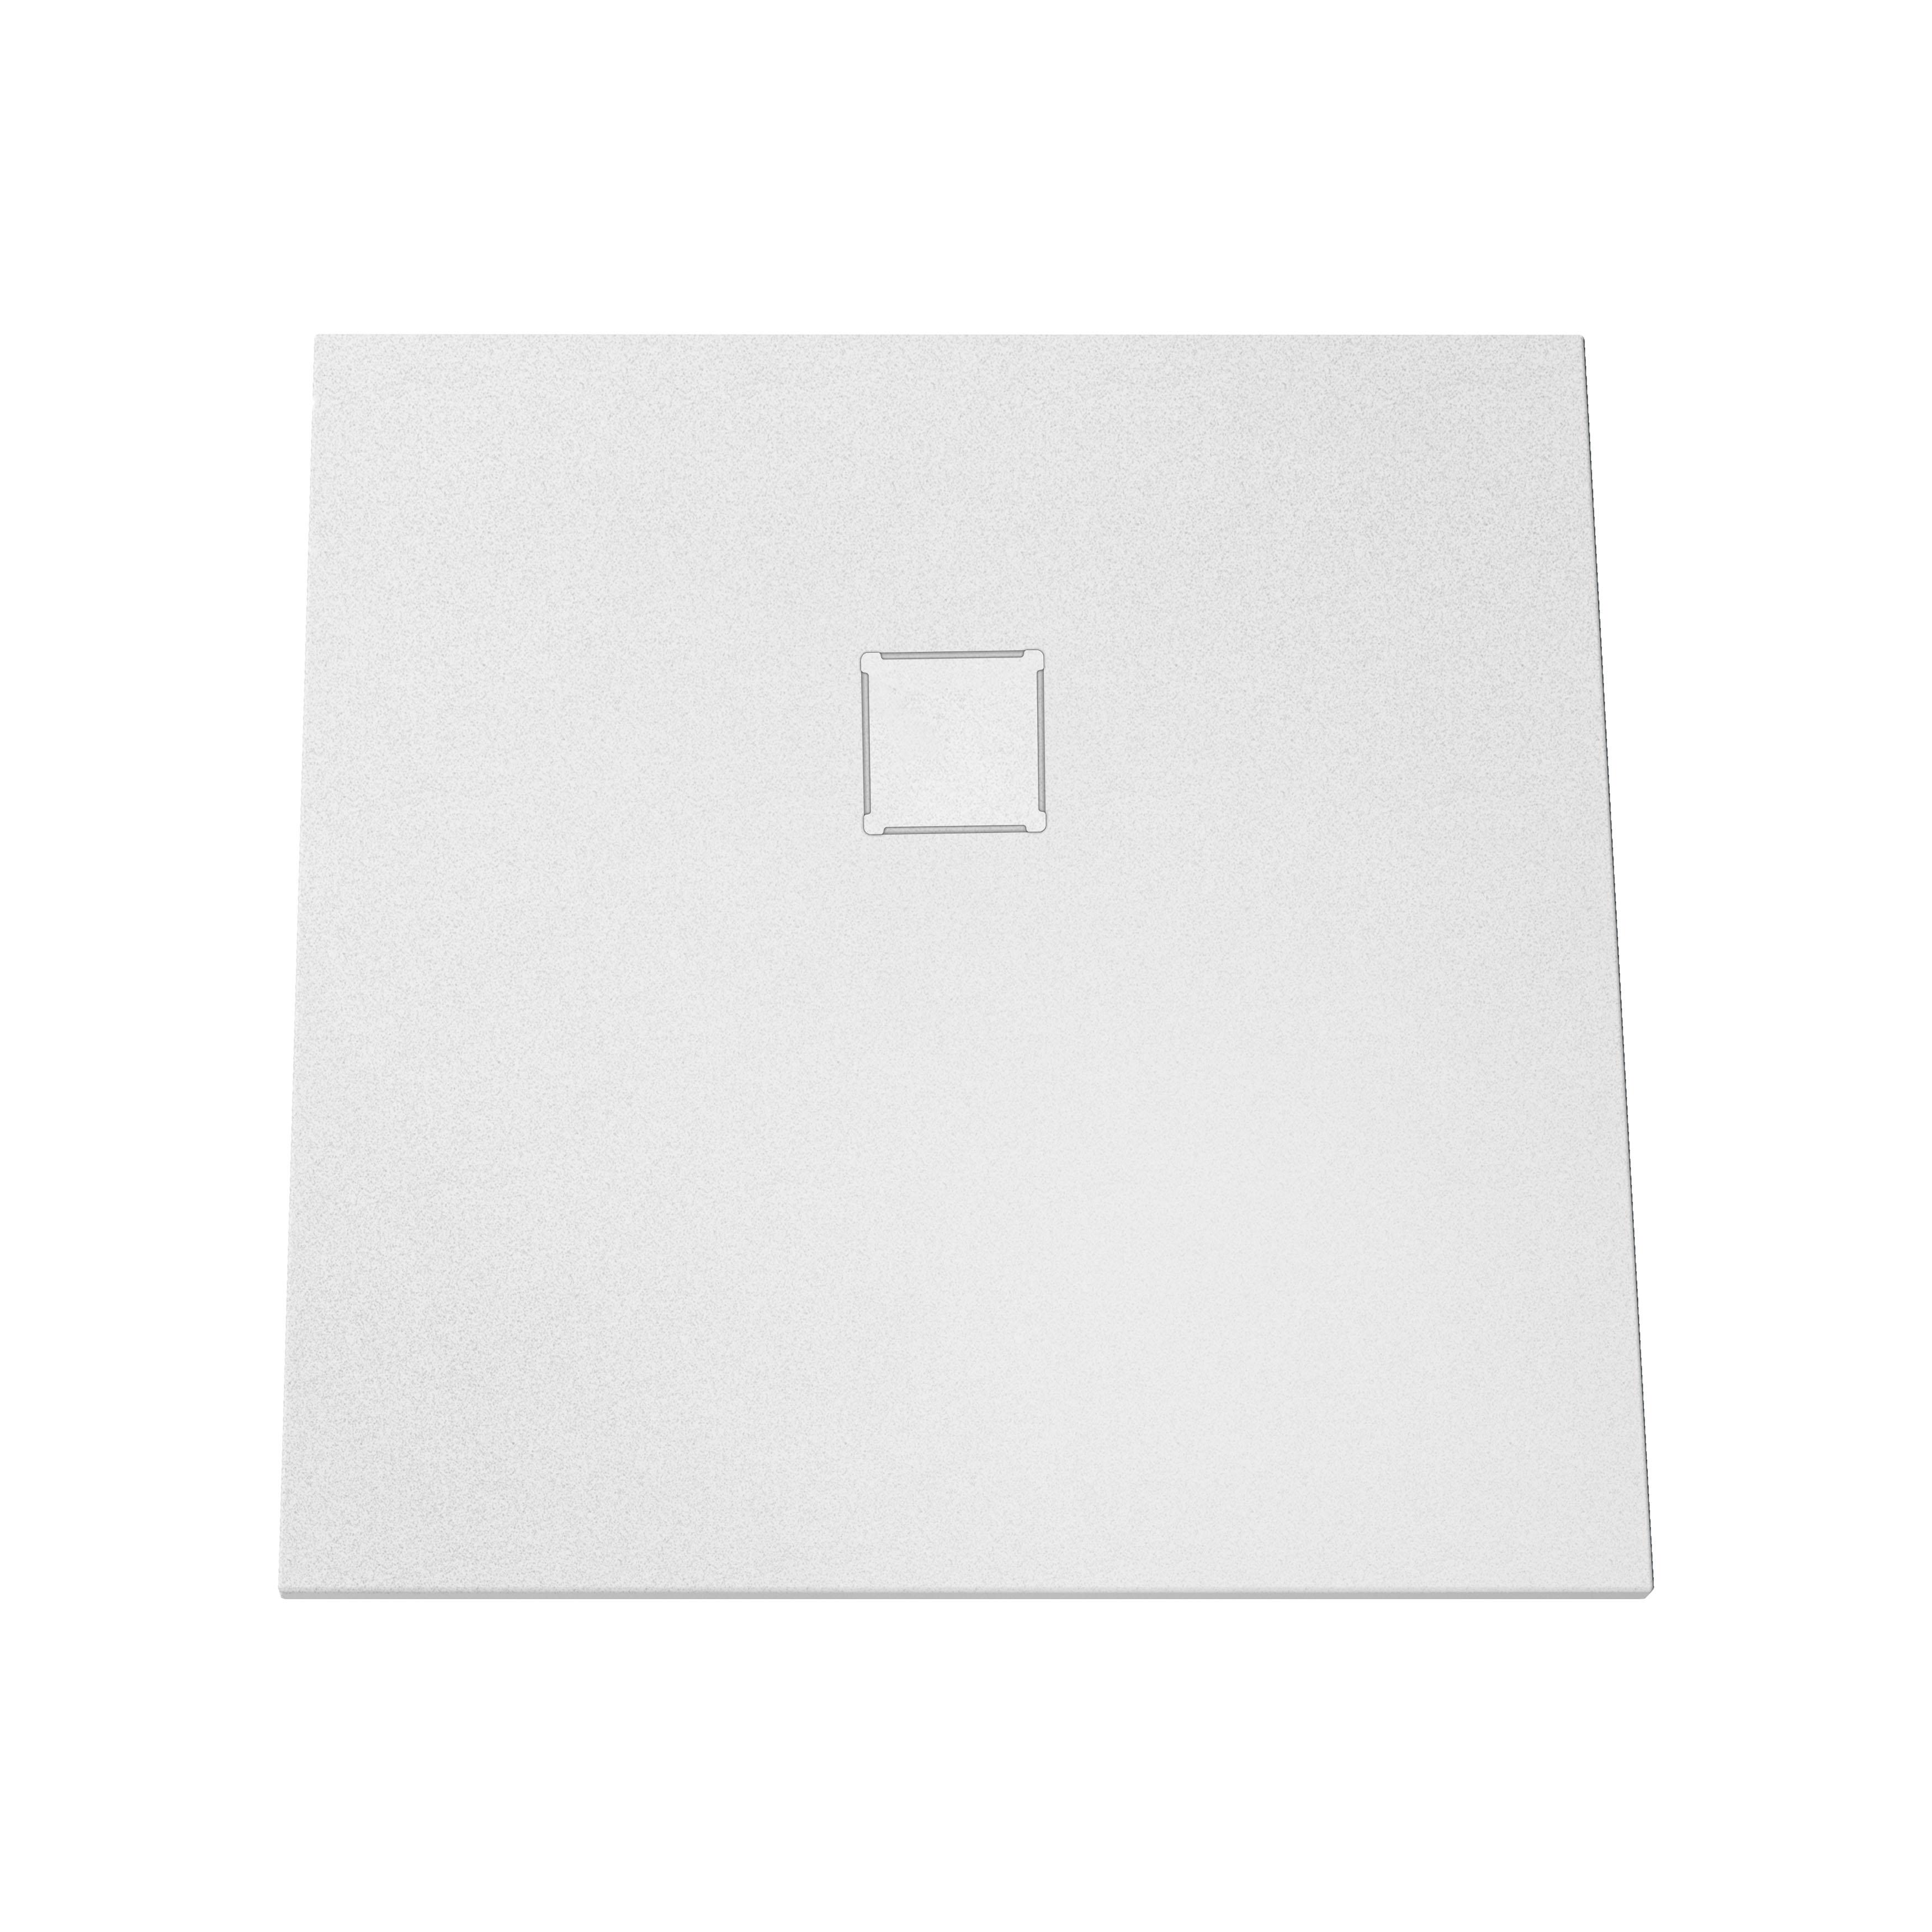 V-stone, receveur ultra plat en solid stone, 100 cm, blanc